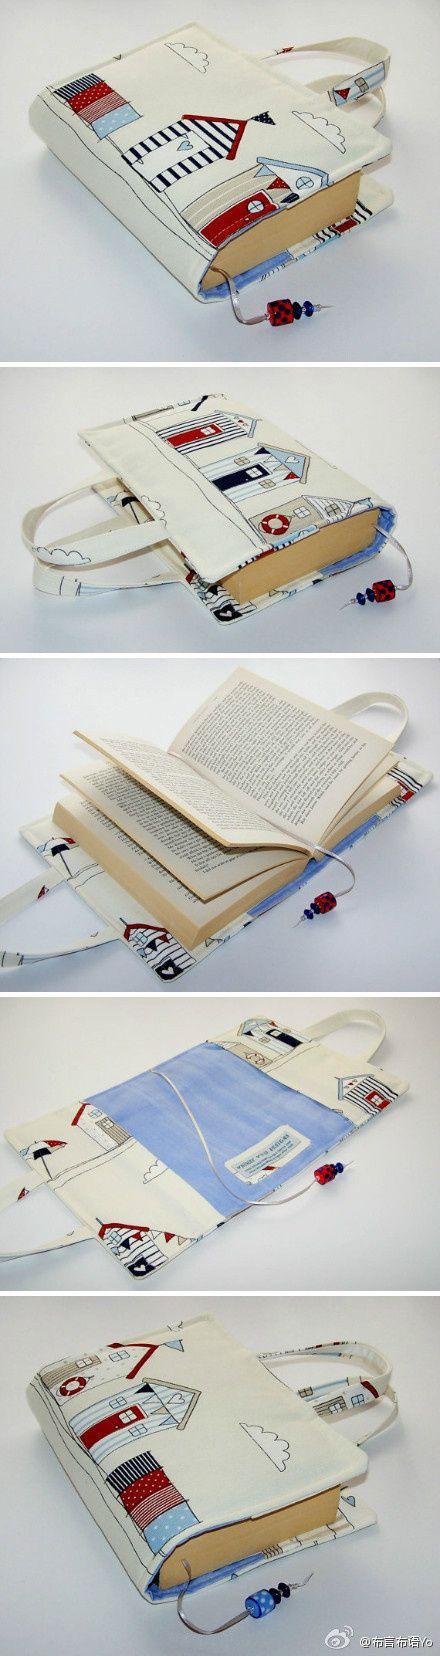 Book Casing